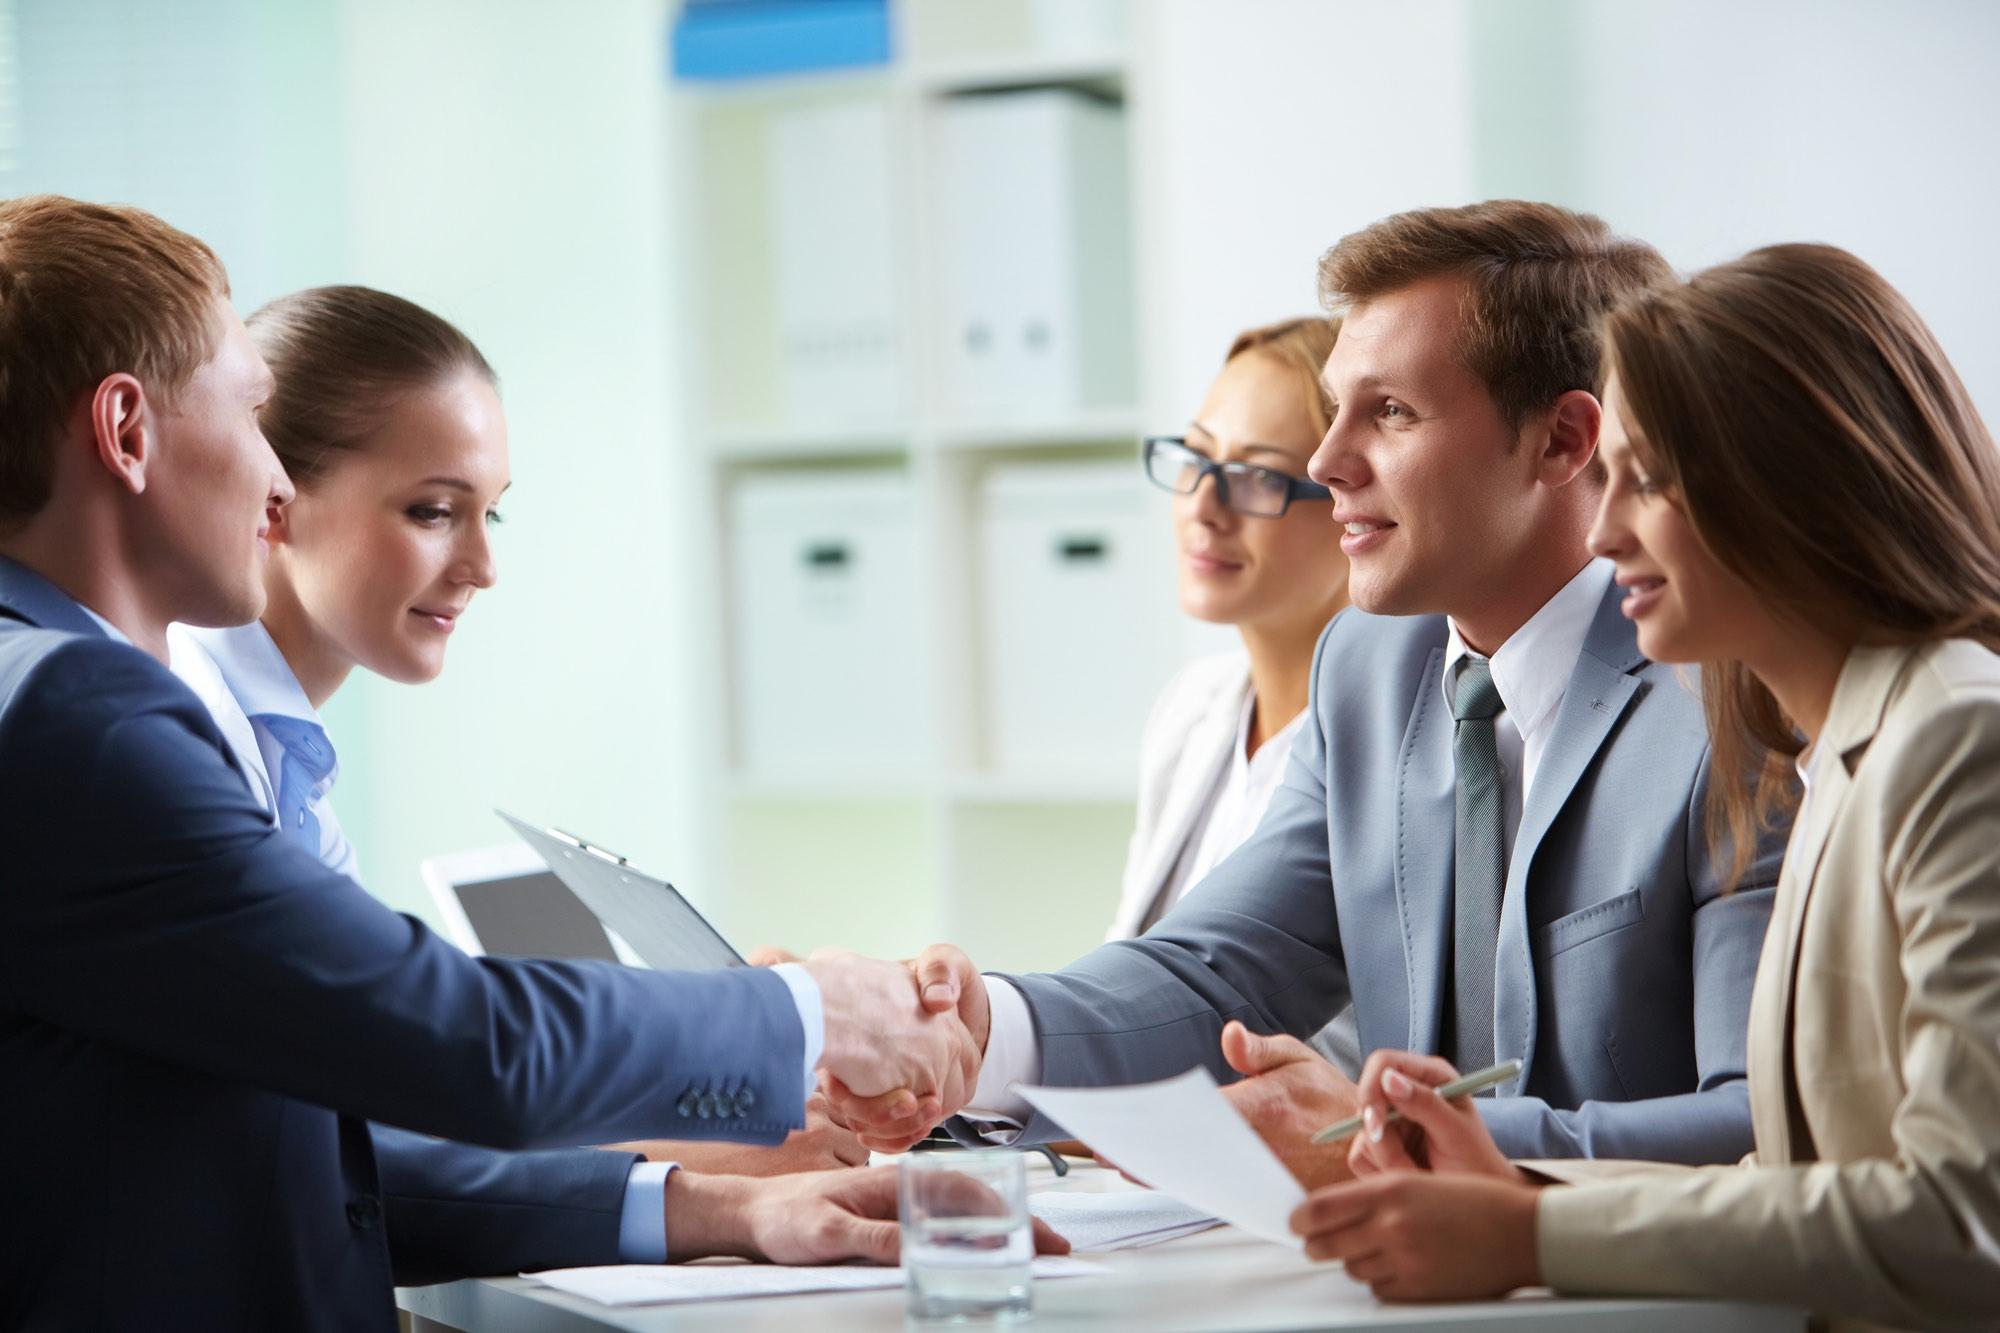 Confident businessmen handshaking at meeting